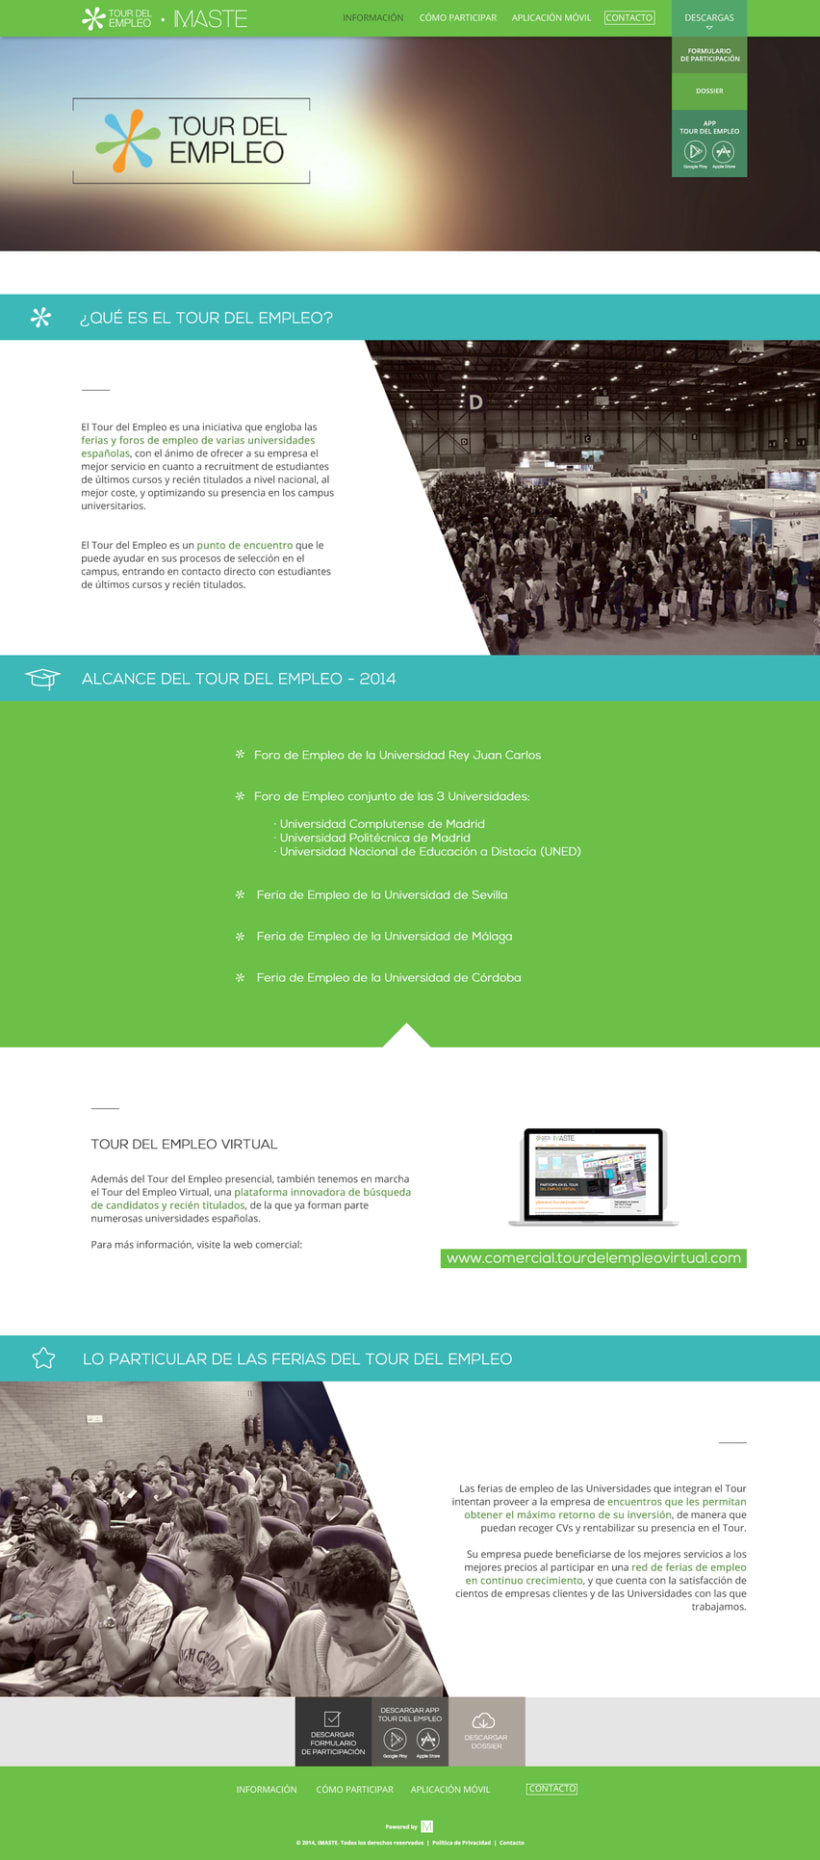 Web design & development for job fair sites 1